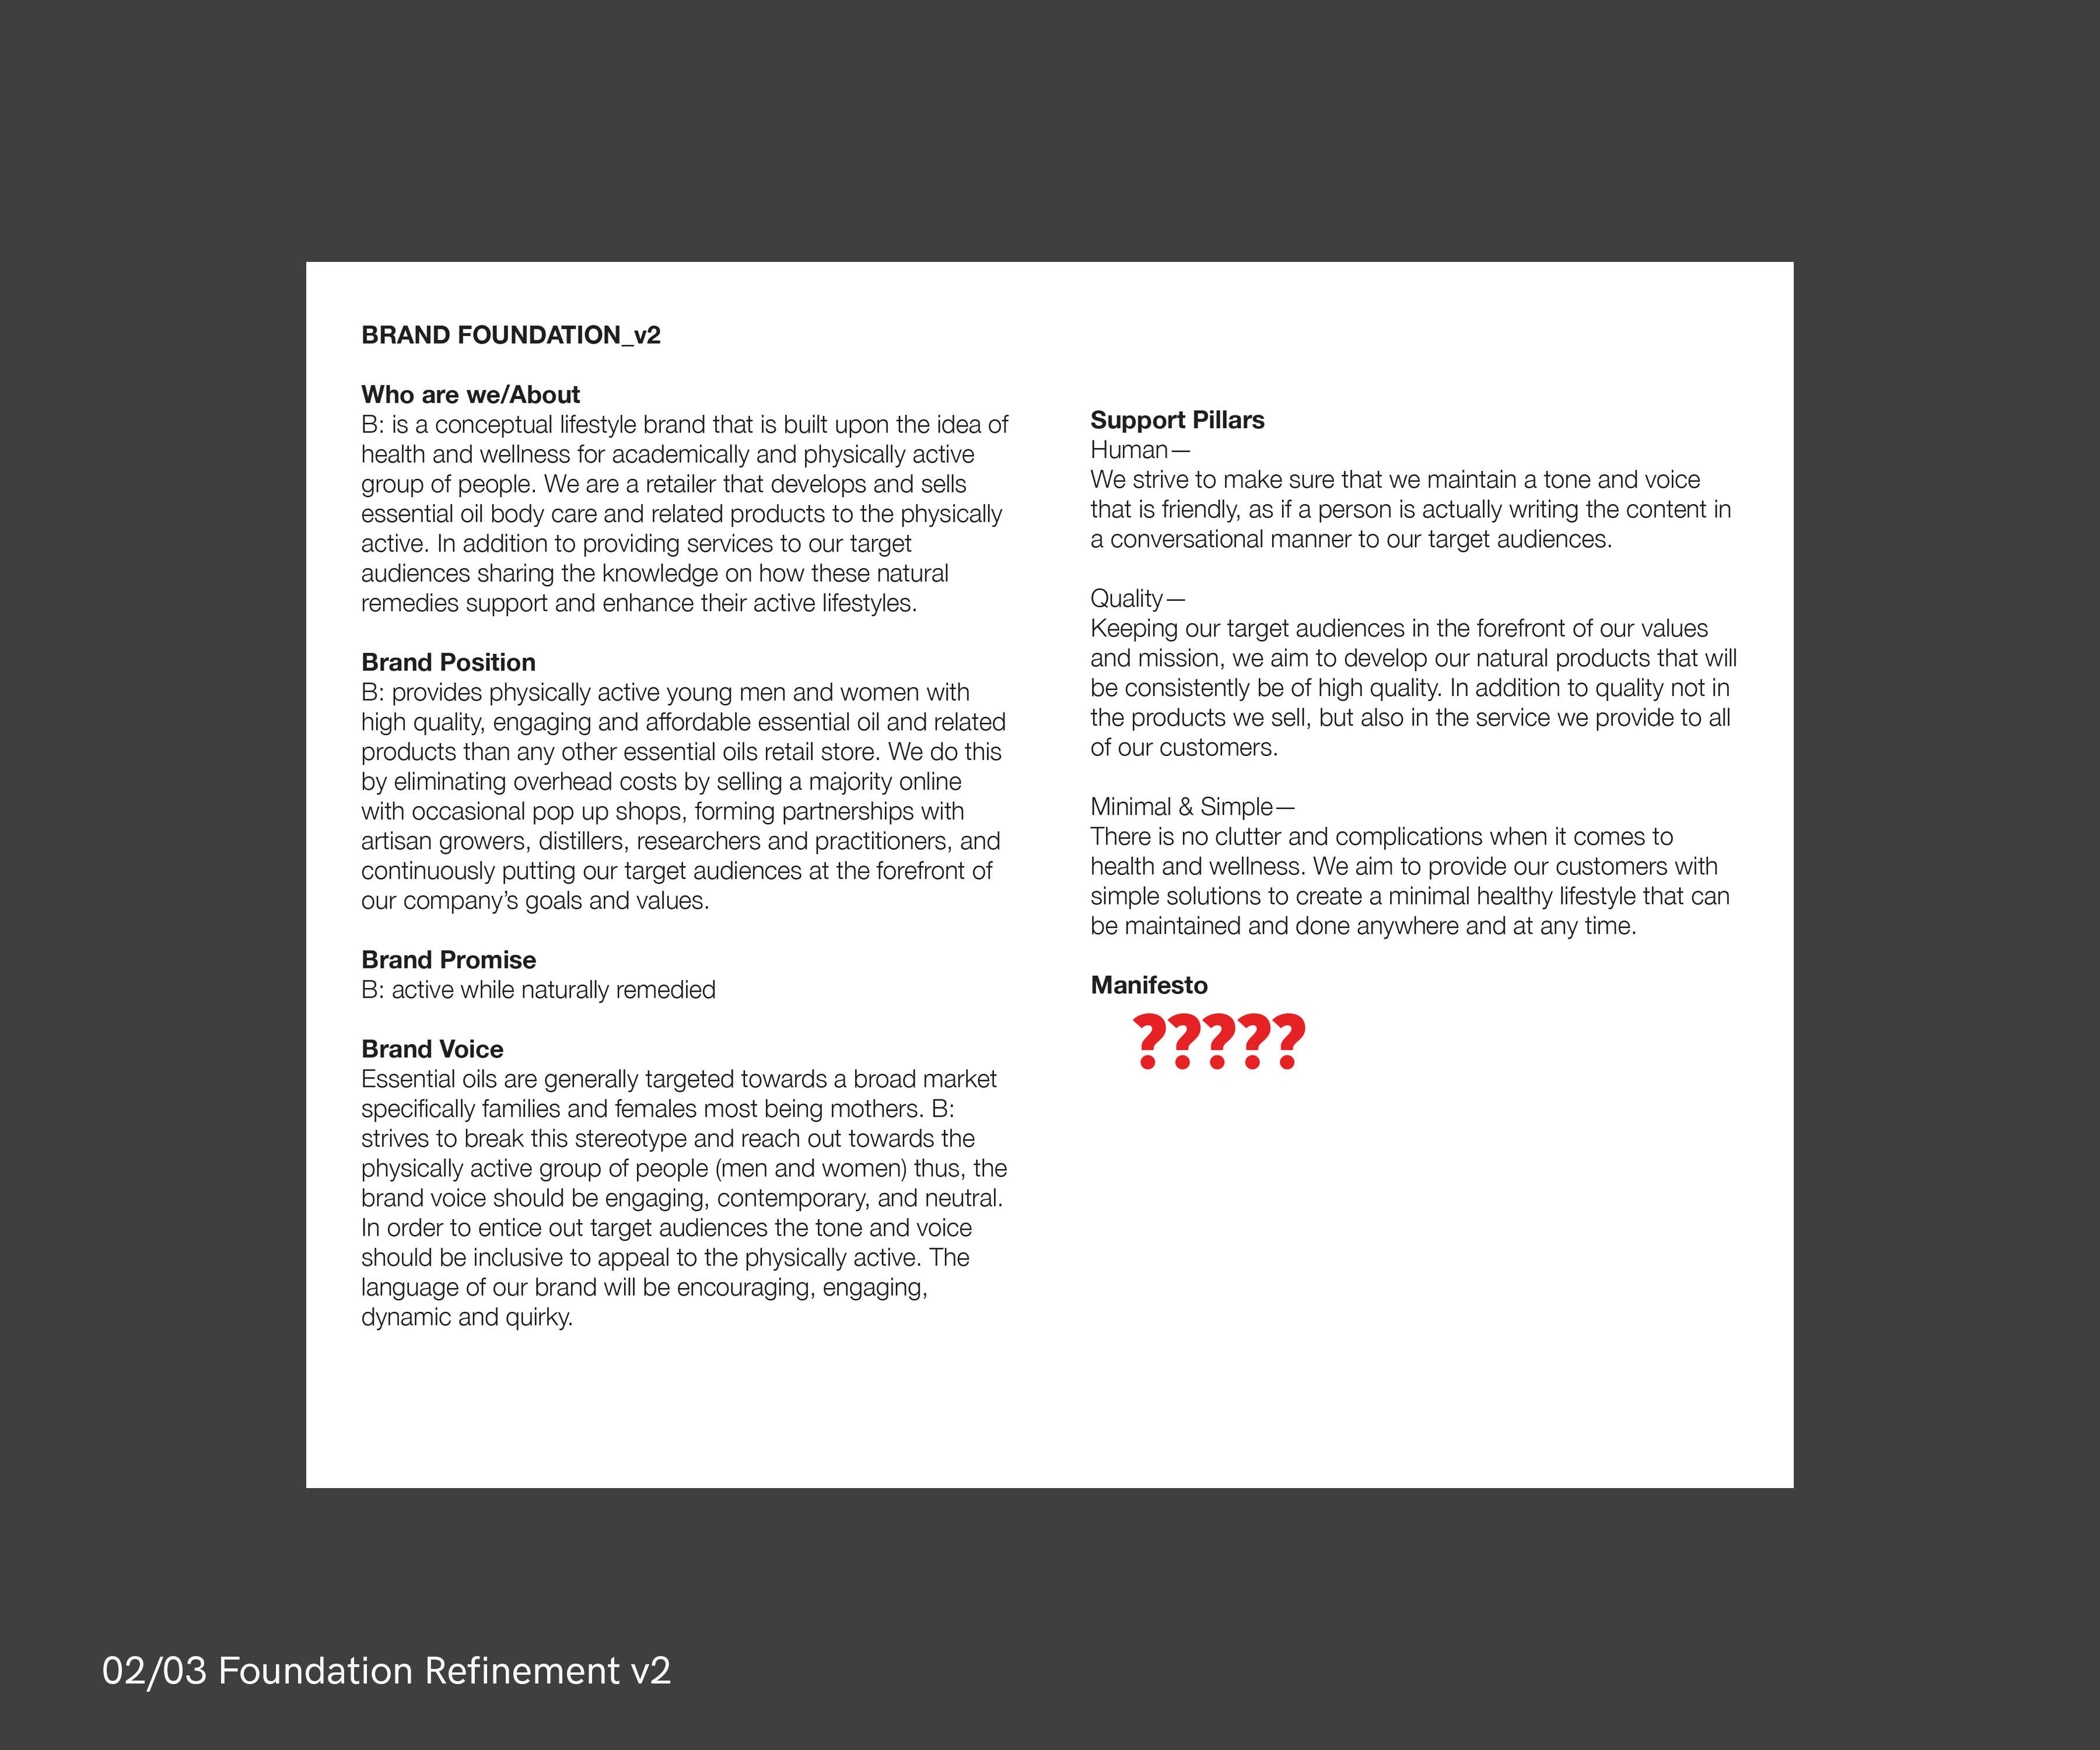 b_process_refinement-2.1